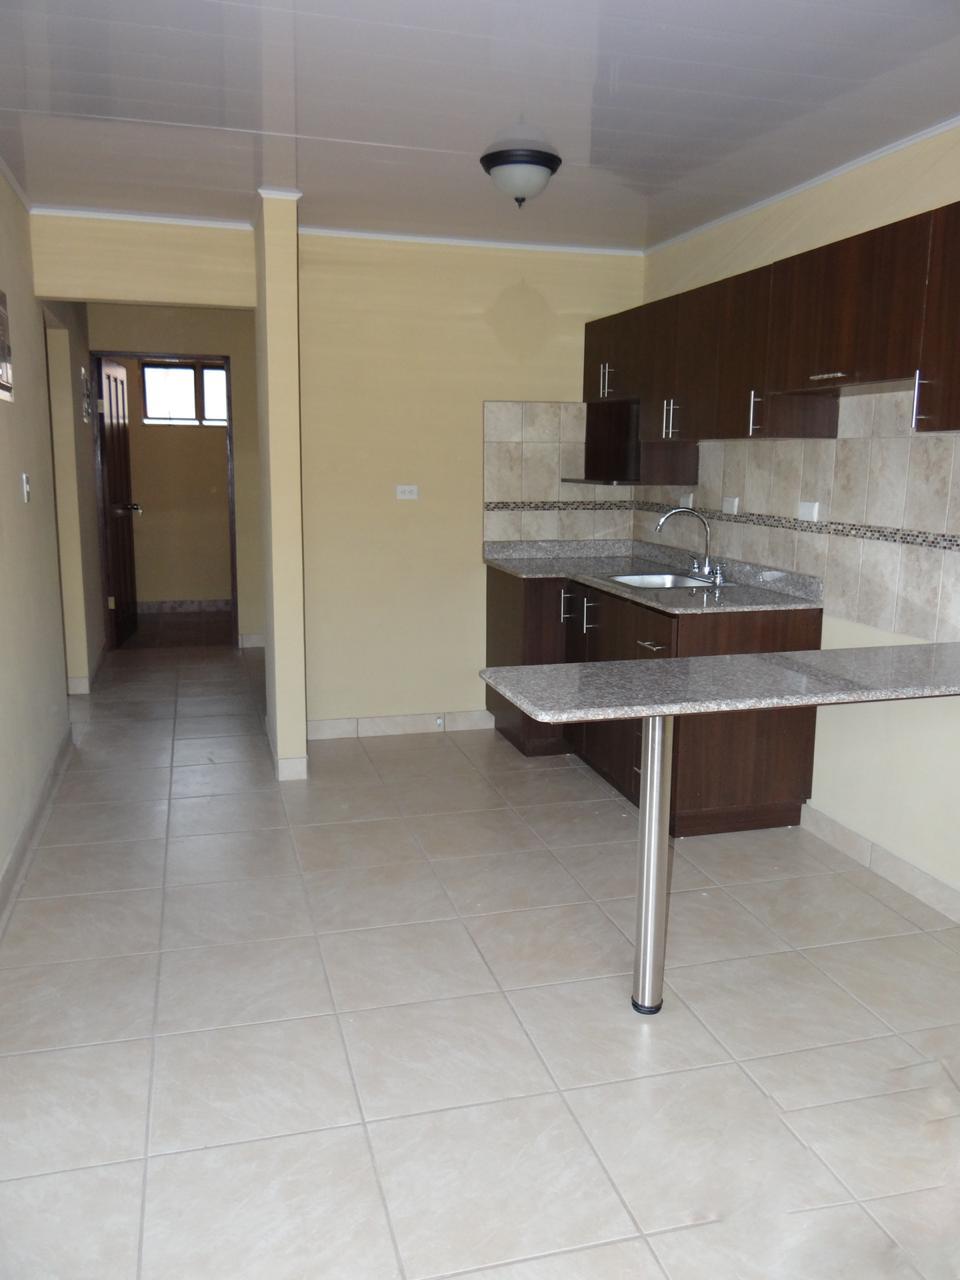 2698 Se alquila apartamento en planta baja en Pozos